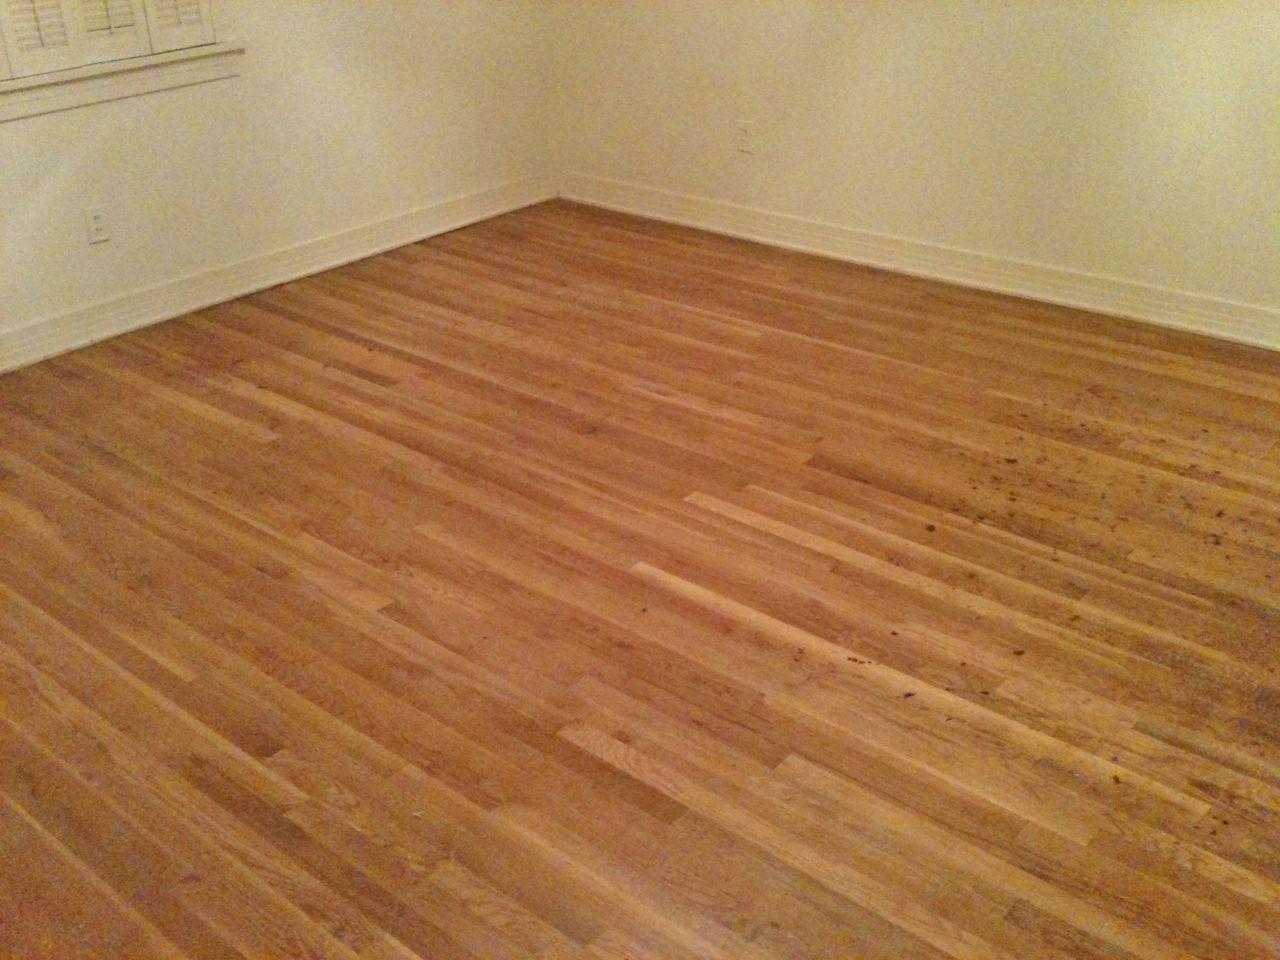 Minwax special walnut 224 on red oak | Hardwood floors ...